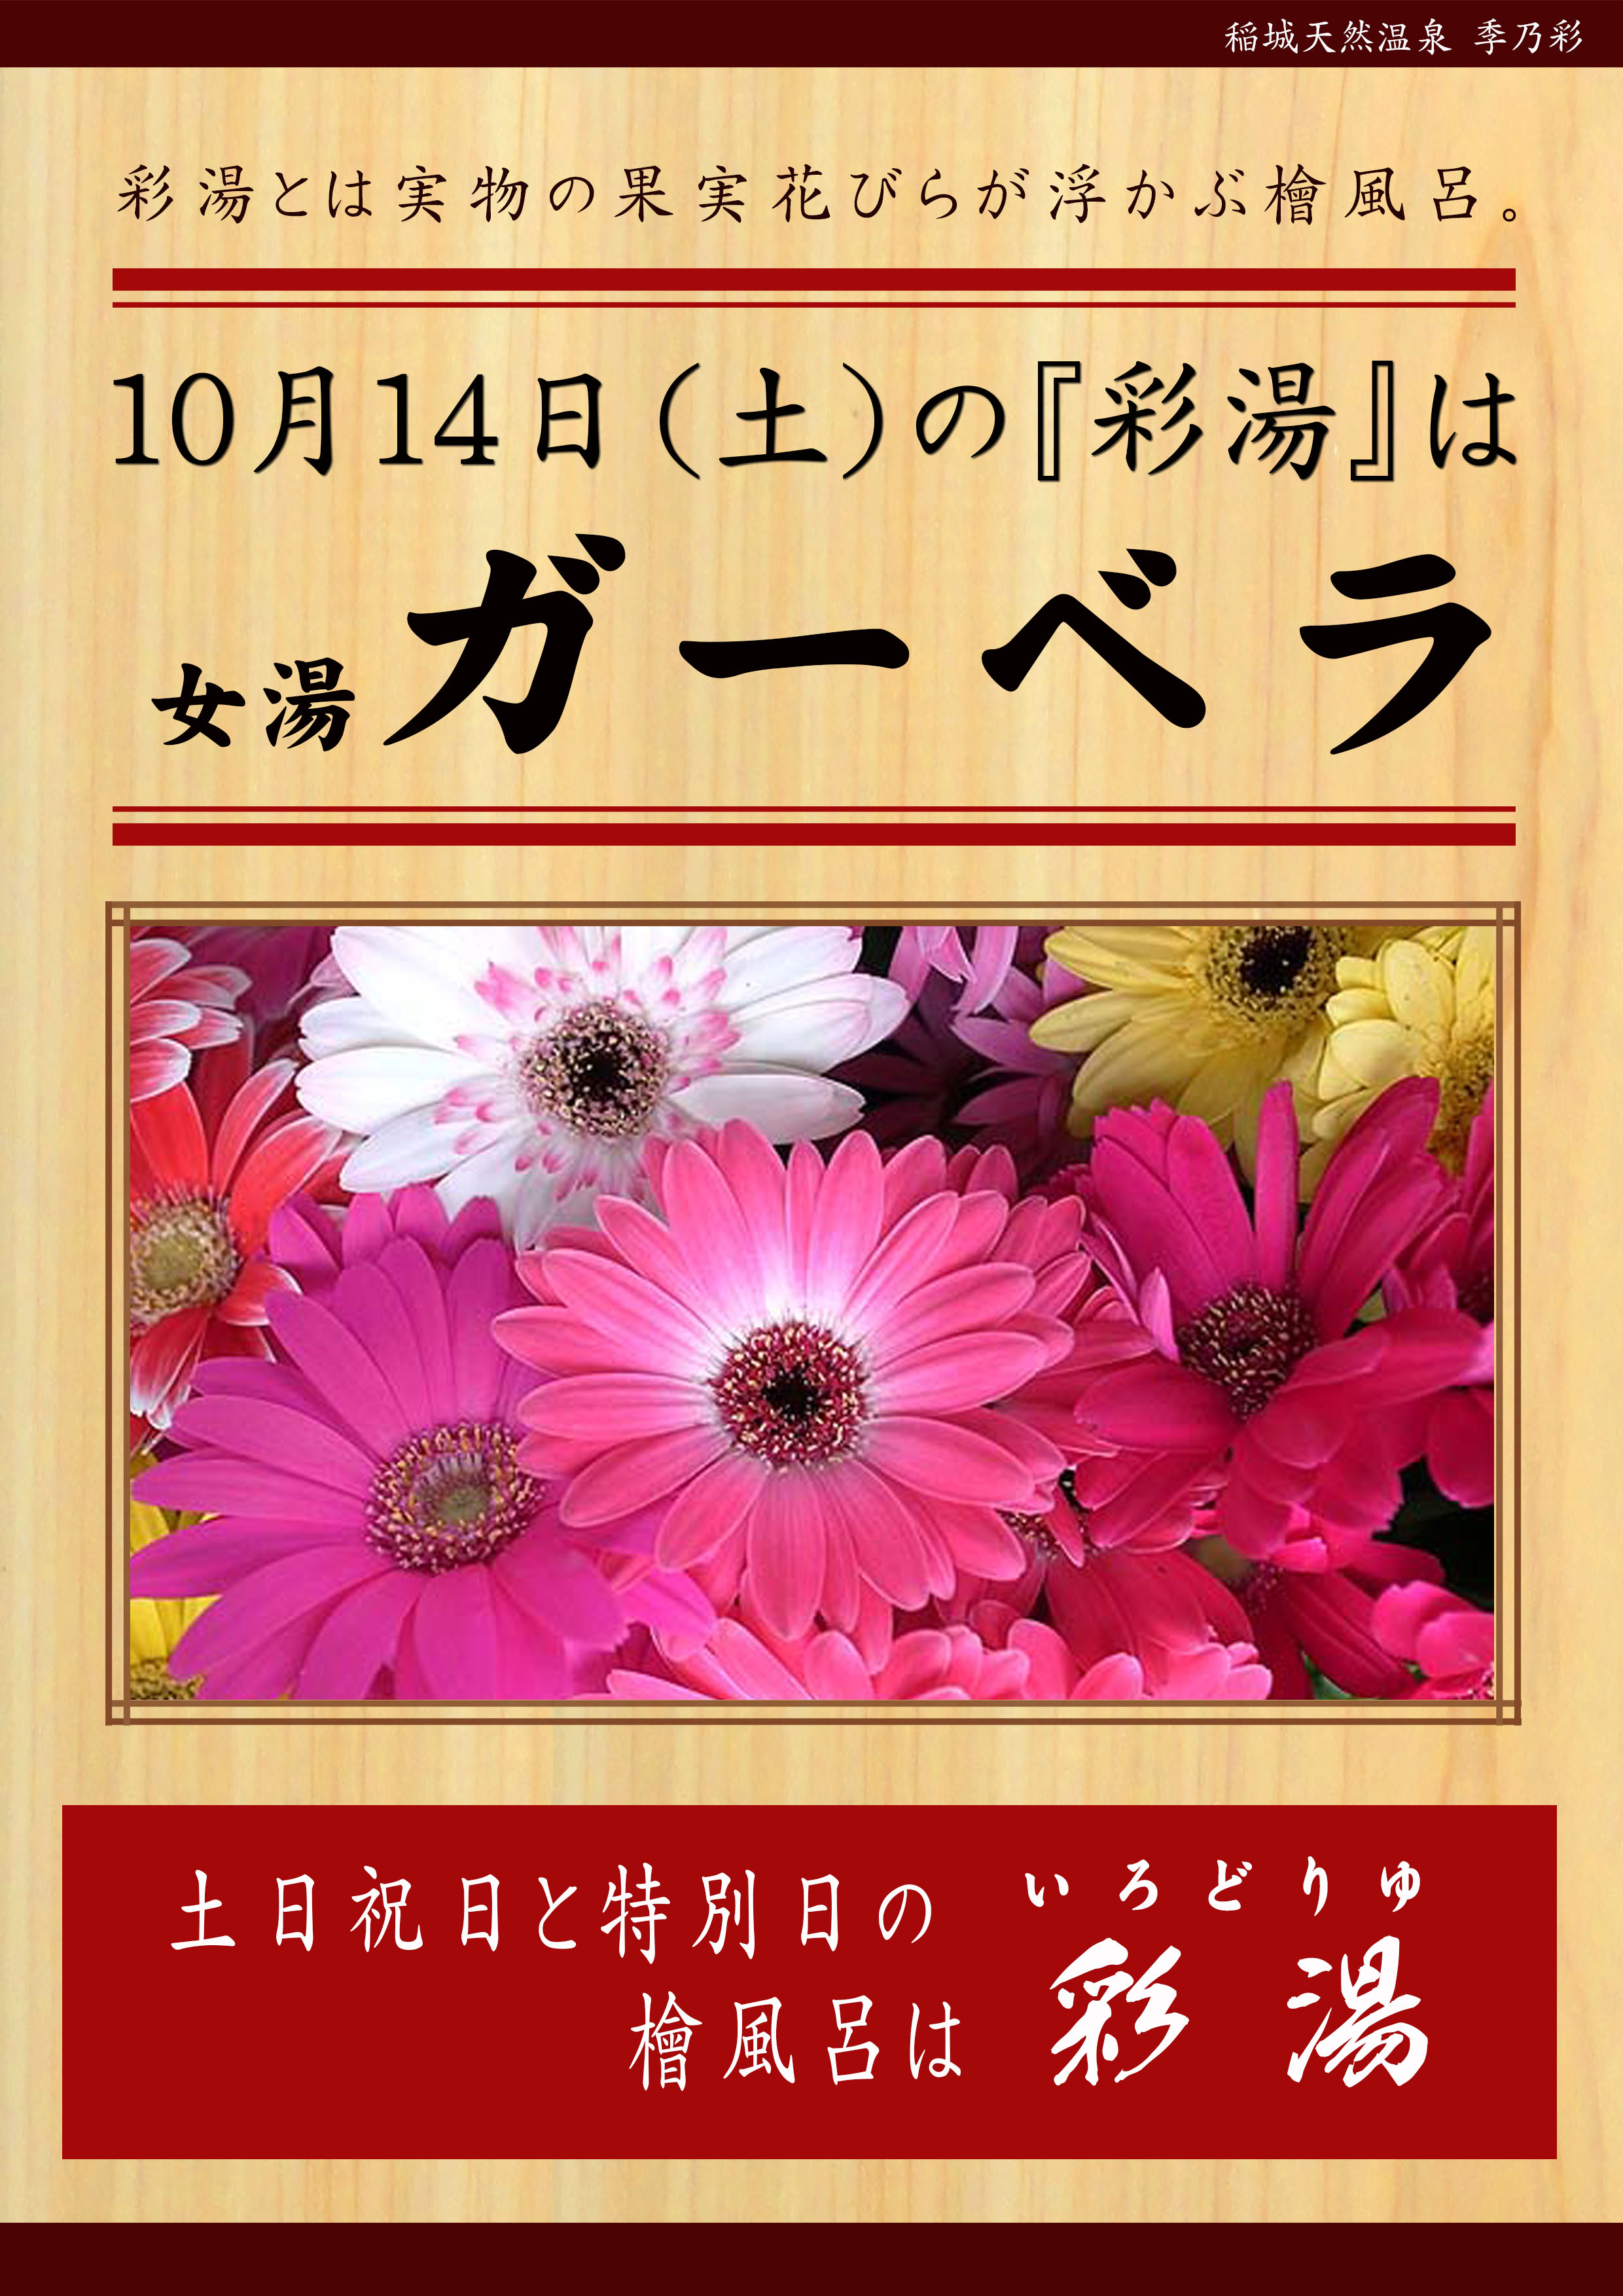 20171014POP イベント 彩湯 ガーベラ